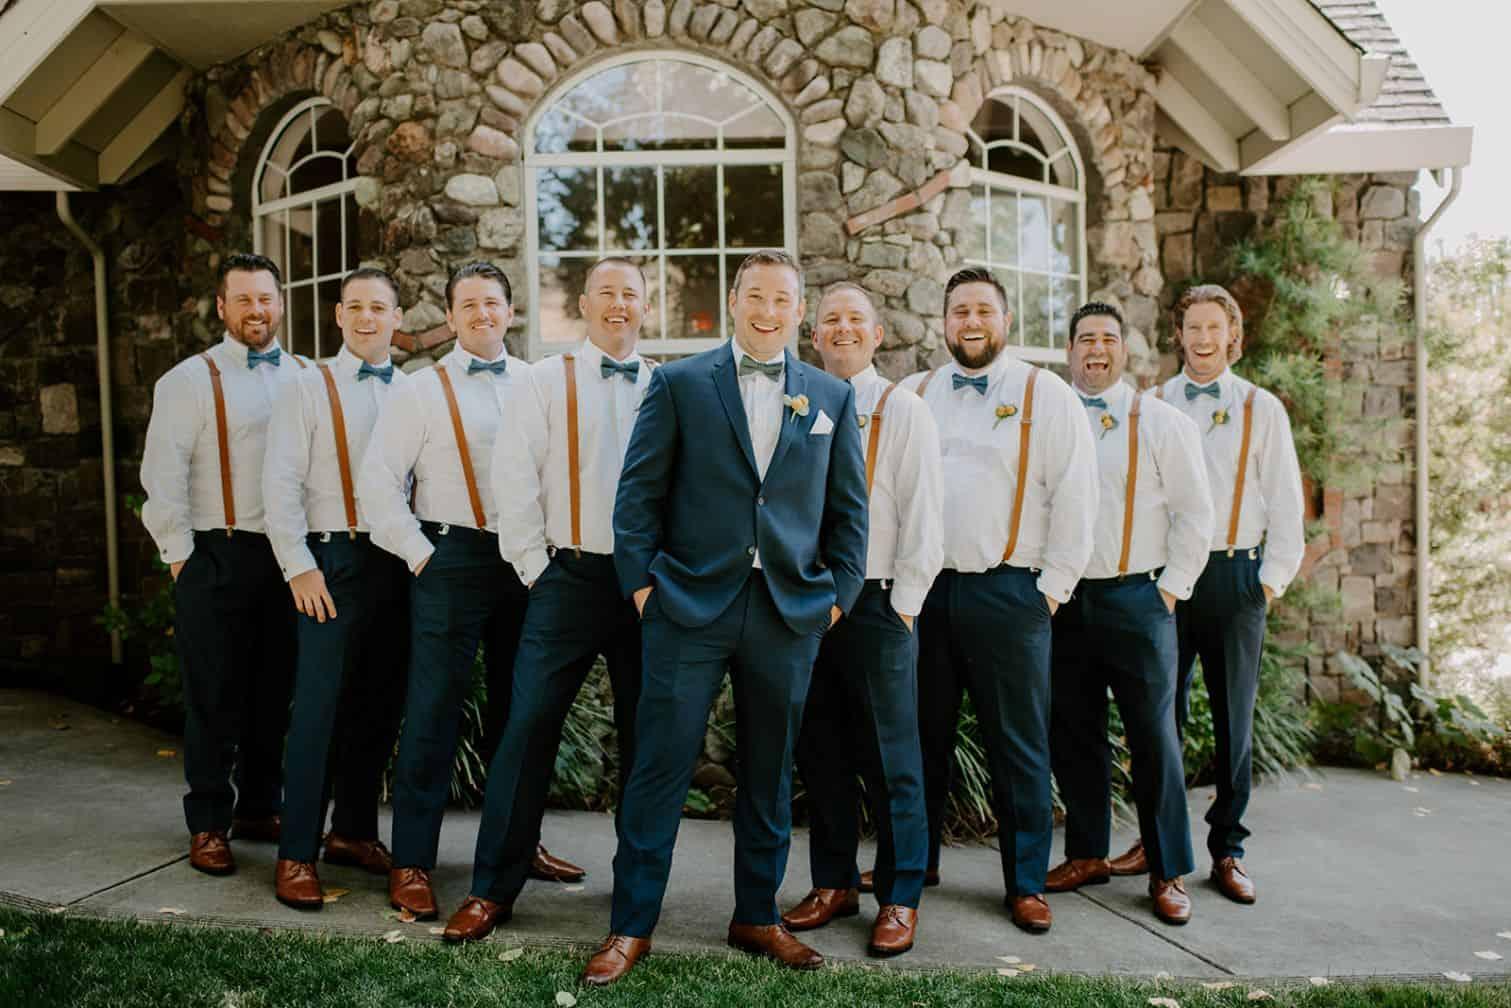 35 photo opportunities rustic mountain house estate weddingi venues northern california